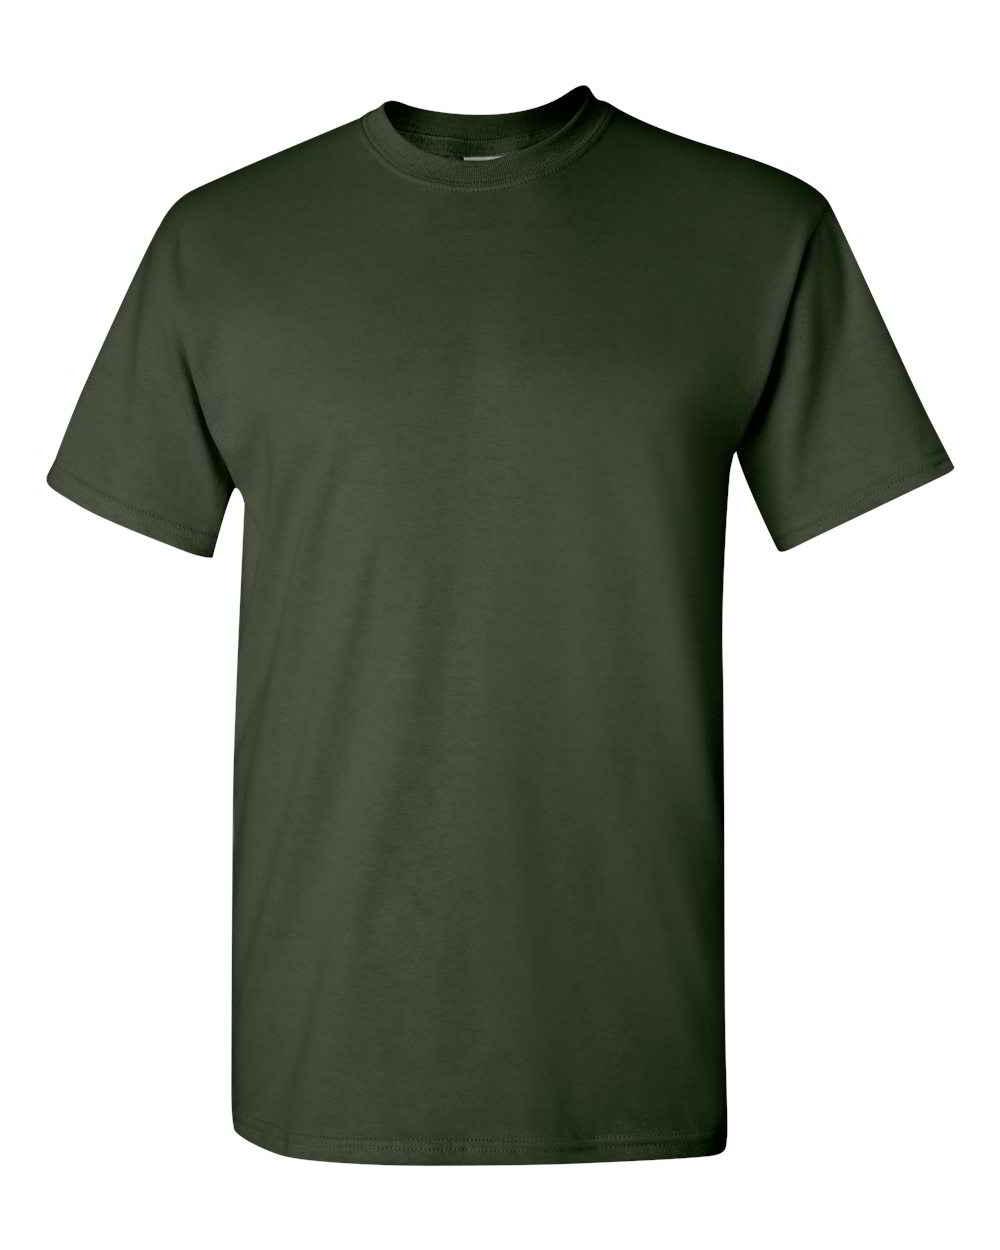 Gildan-Heavy-Cotton-Short-Sleeve-Mens-Green-T-Shirts-5000 thumbnail 7